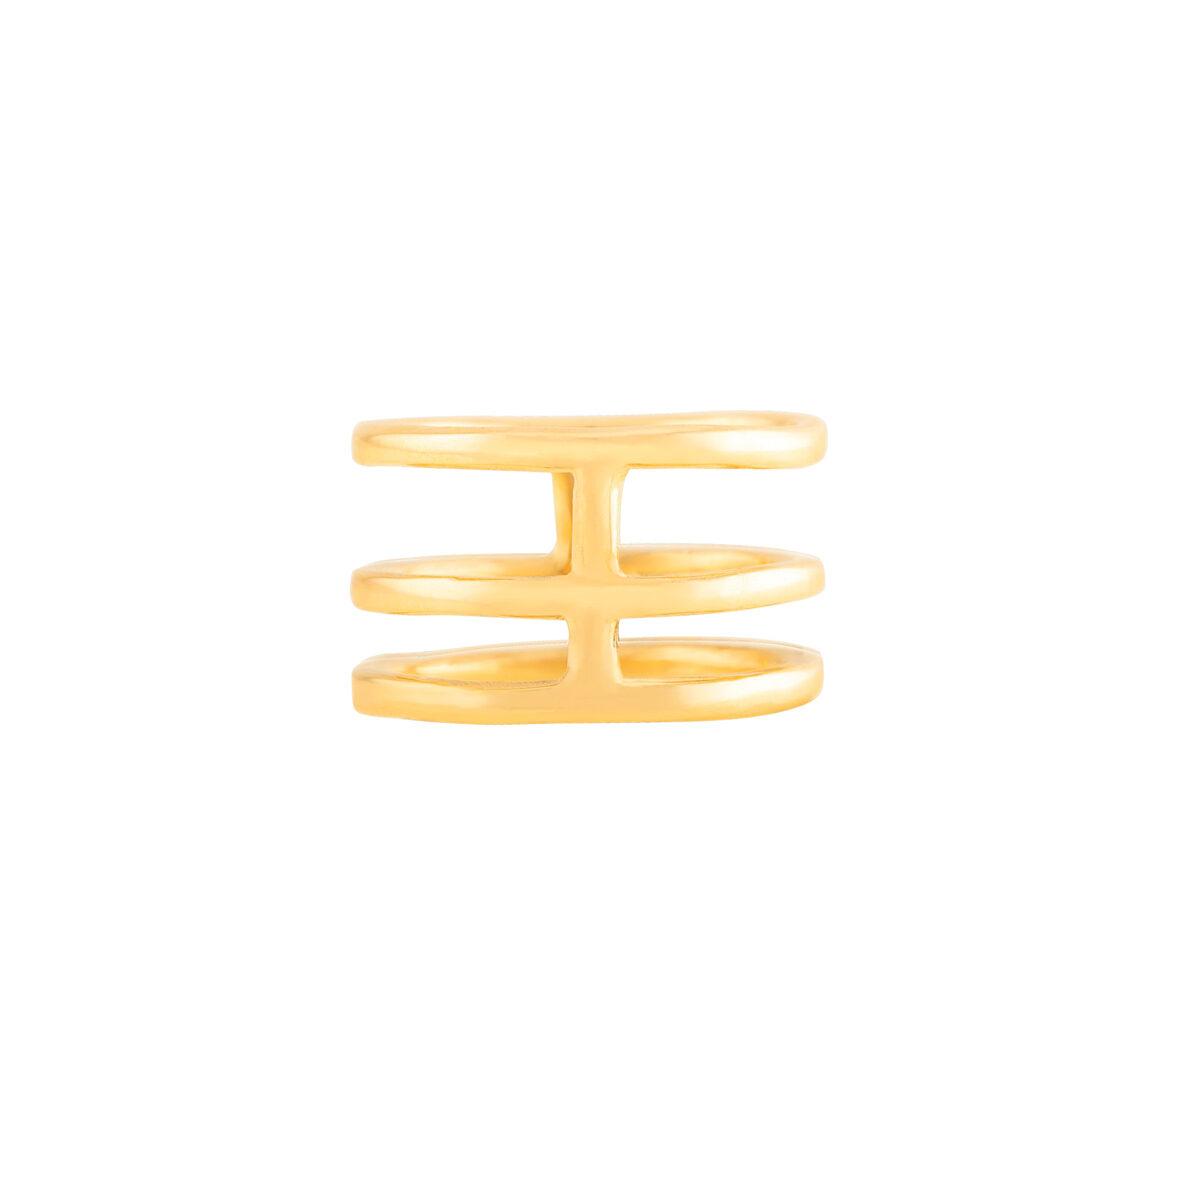 انگشتر طانگشتر طلا سه رینگ متصللا سه رینگ